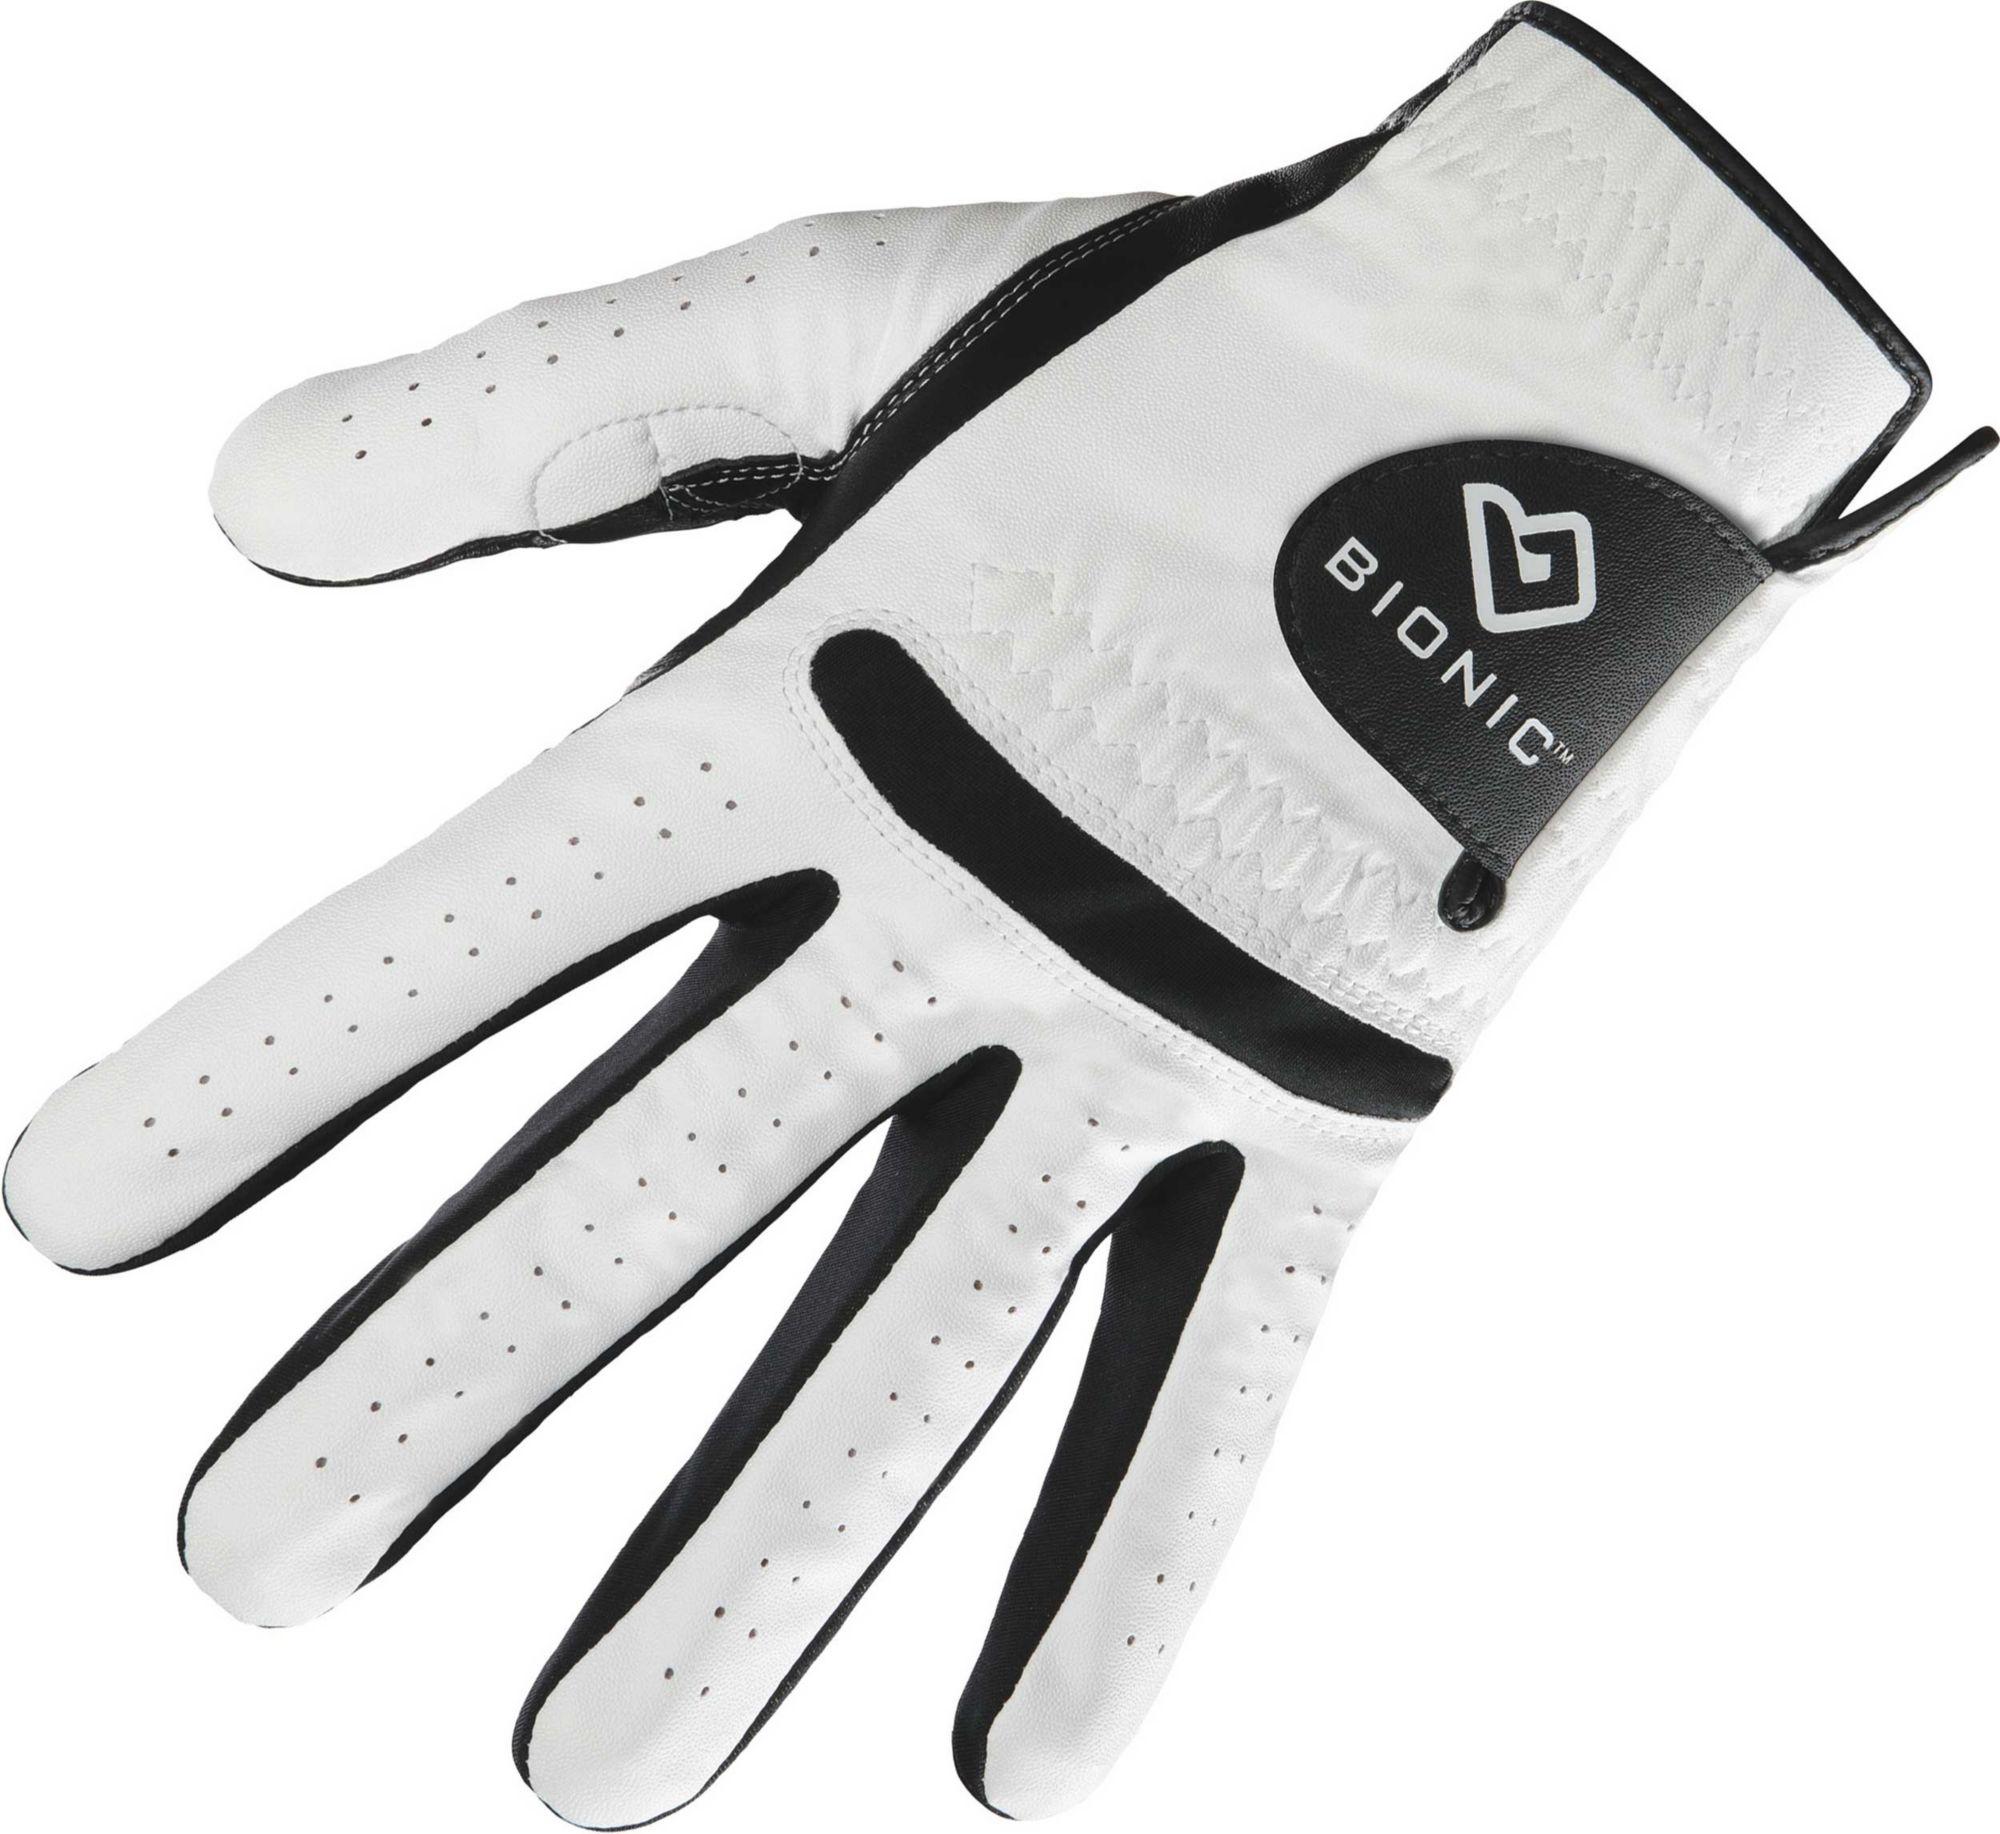 Black leather golf gloves - Product Image Bionic Men S Relaxgrip Black Palm Golf Glove